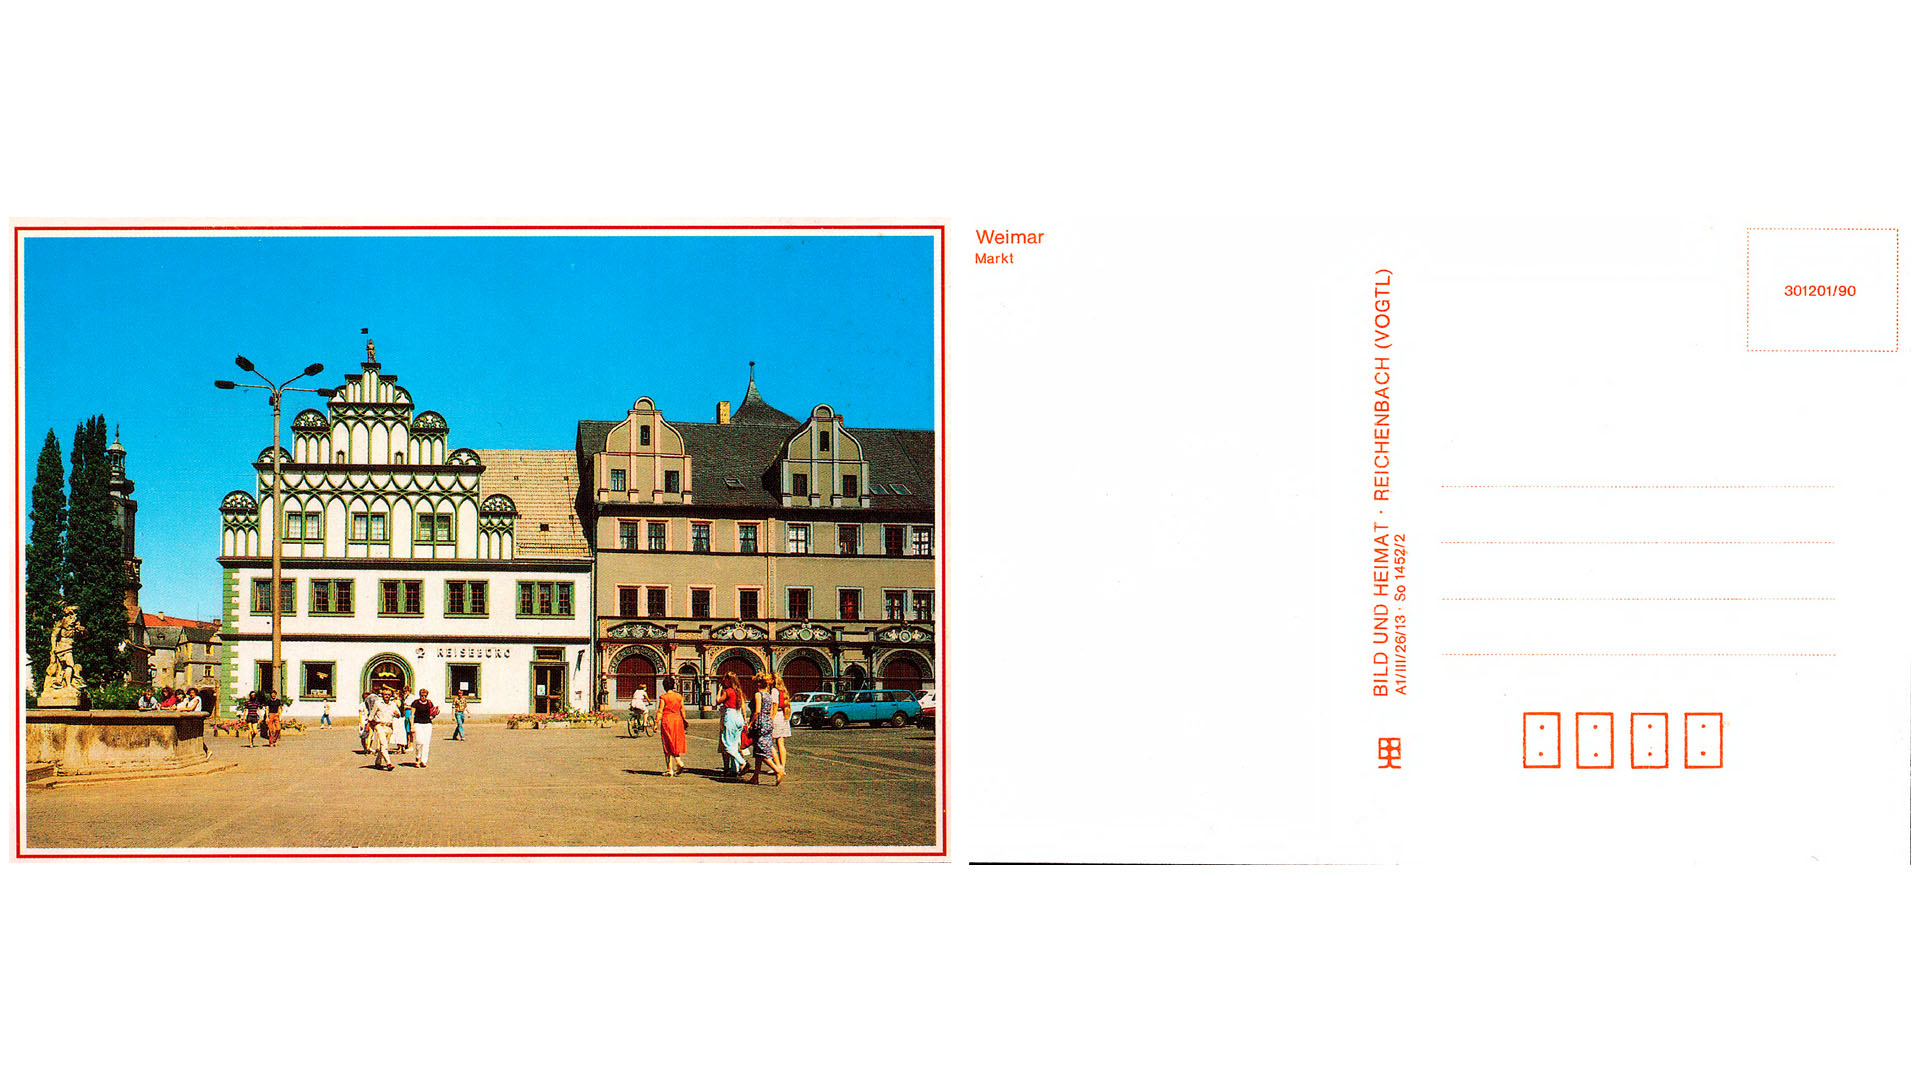 Weimar - Markt